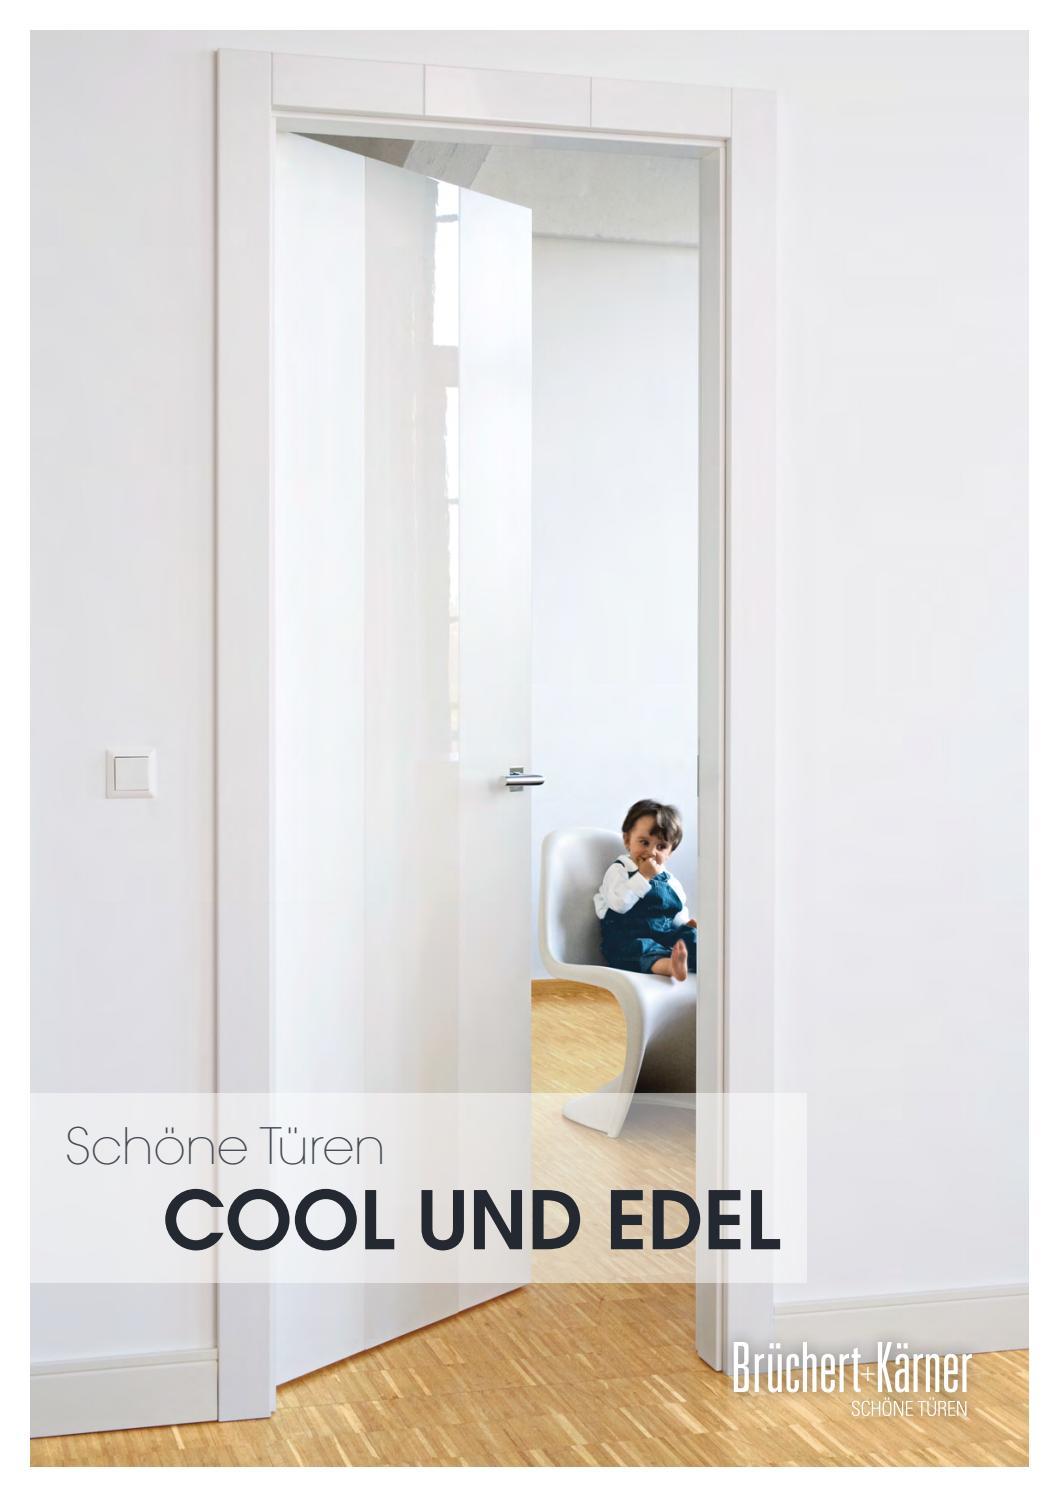 br chert k rner cool und edel by kaiser design issuu. Black Bedroom Furniture Sets. Home Design Ideas